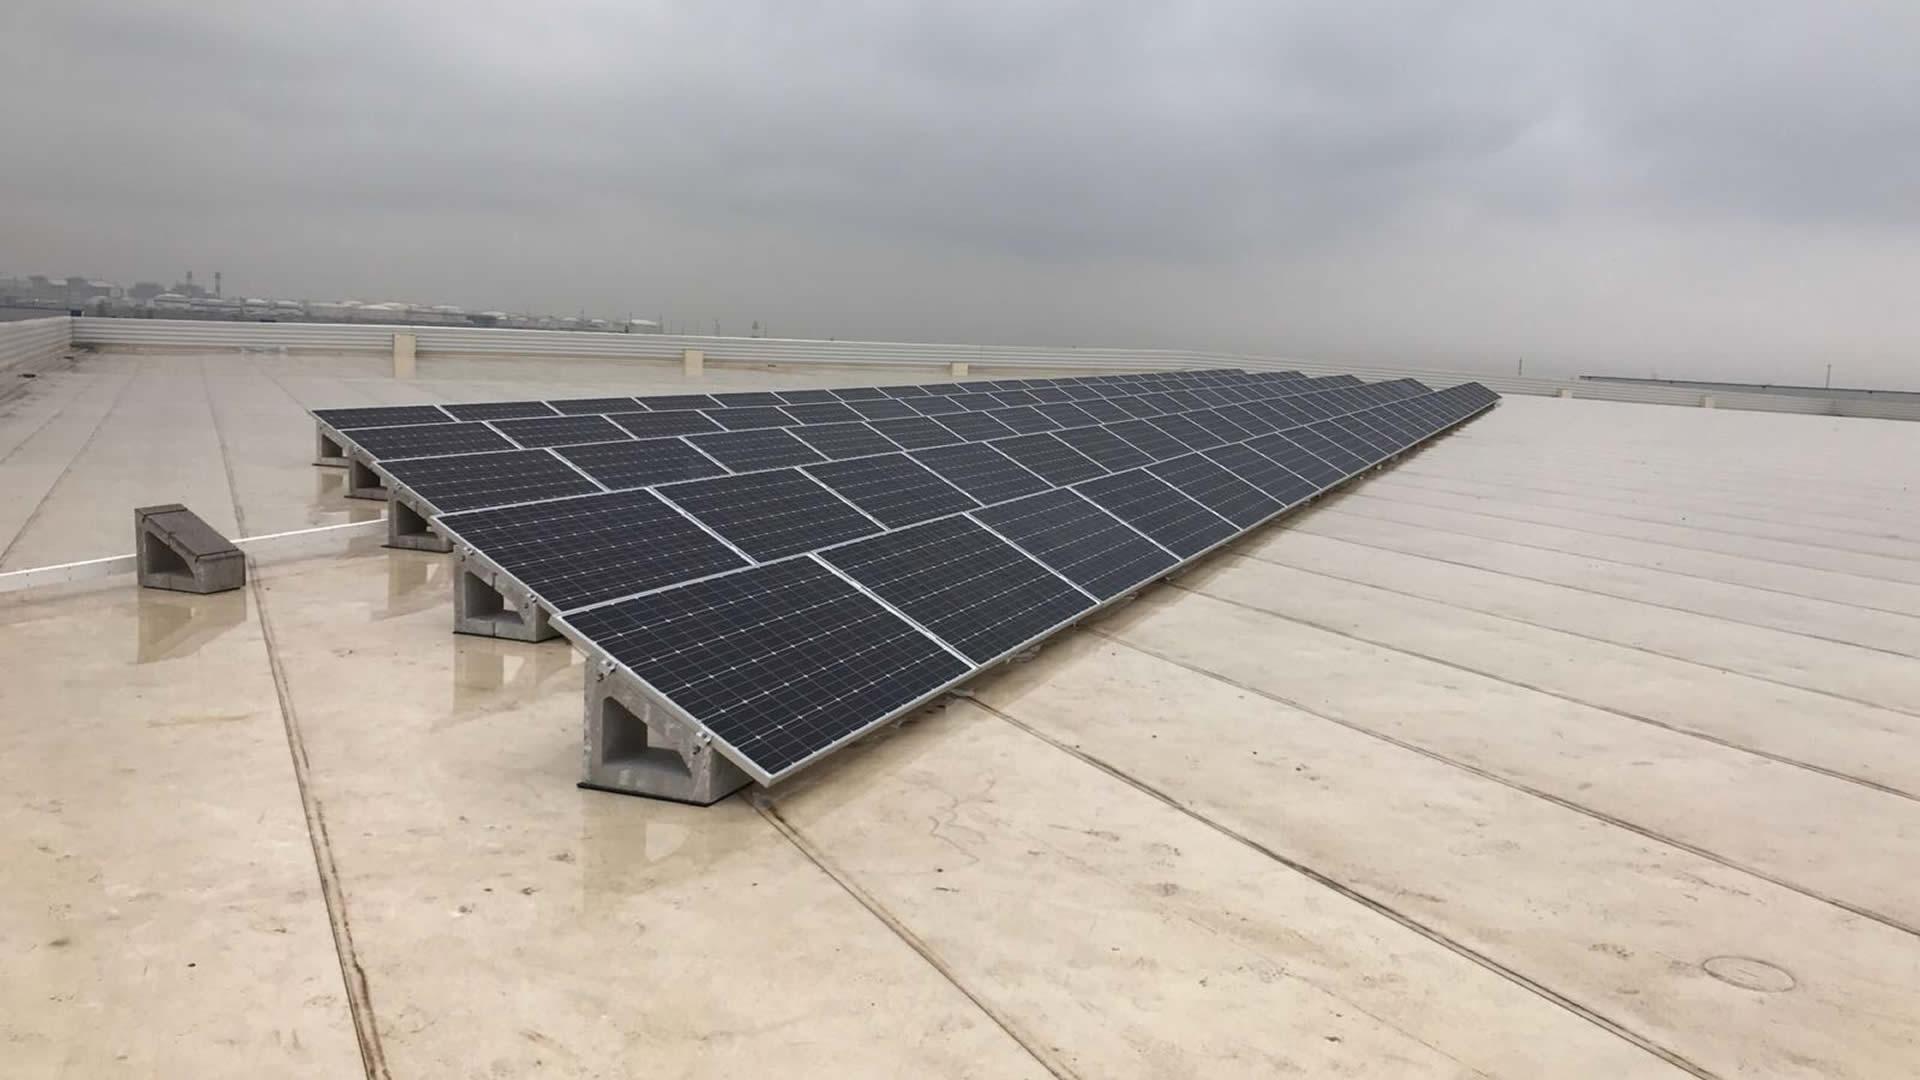 Instalaci n de energ a solar fotovoltaica en dhl barcelona edf solar - Solar barcelona ...